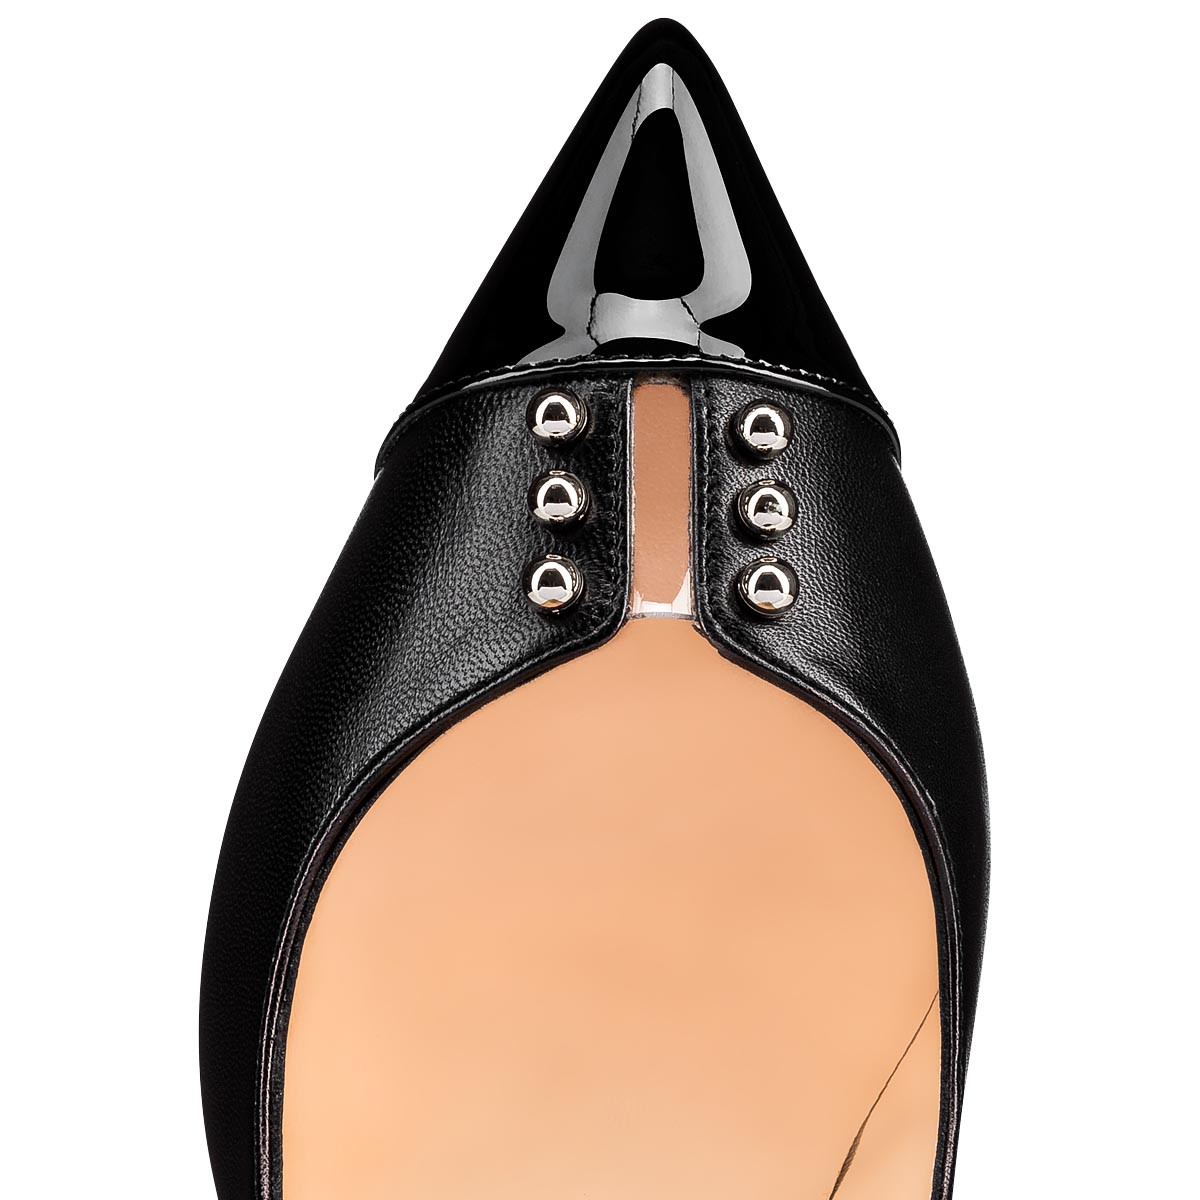 鞋履 - Predupump 085 Nappa - Christian Louboutin